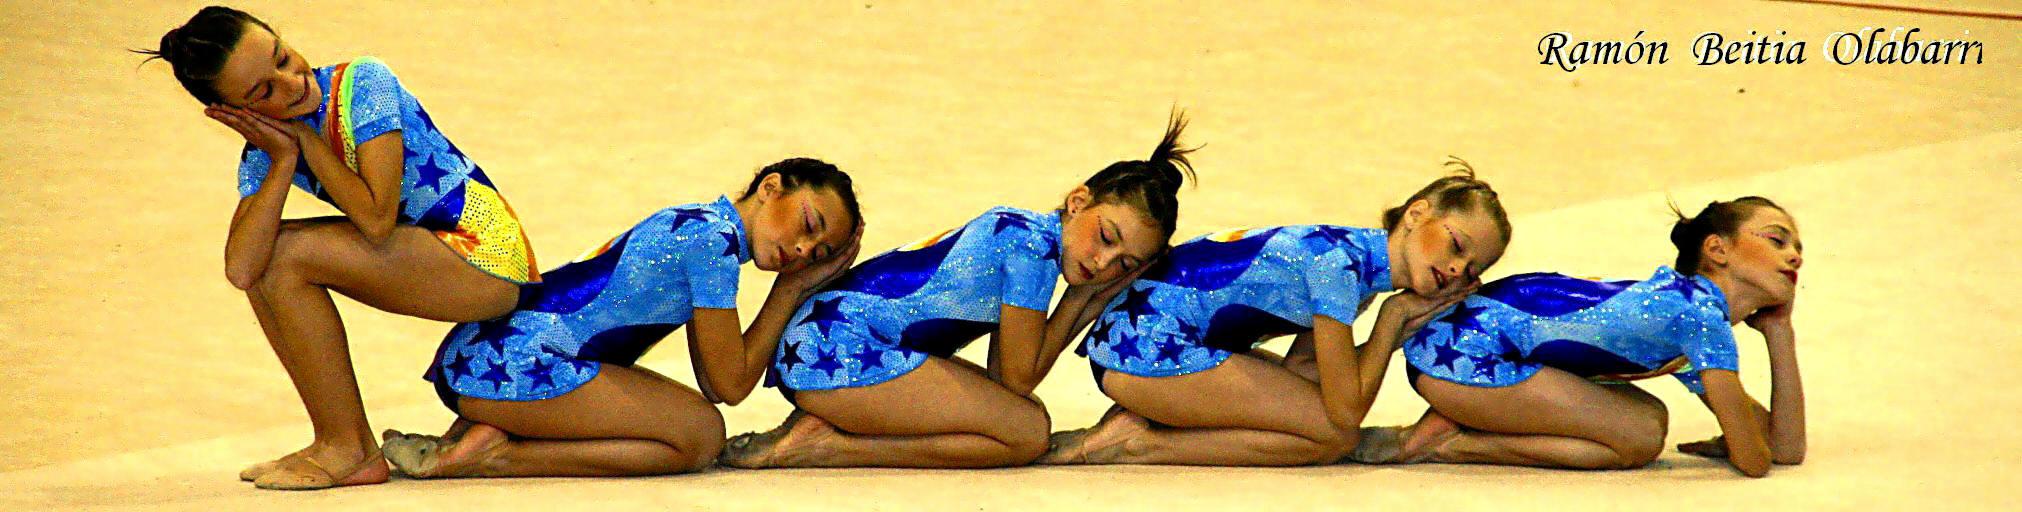 galeria de foto de gimnasia ritmica: